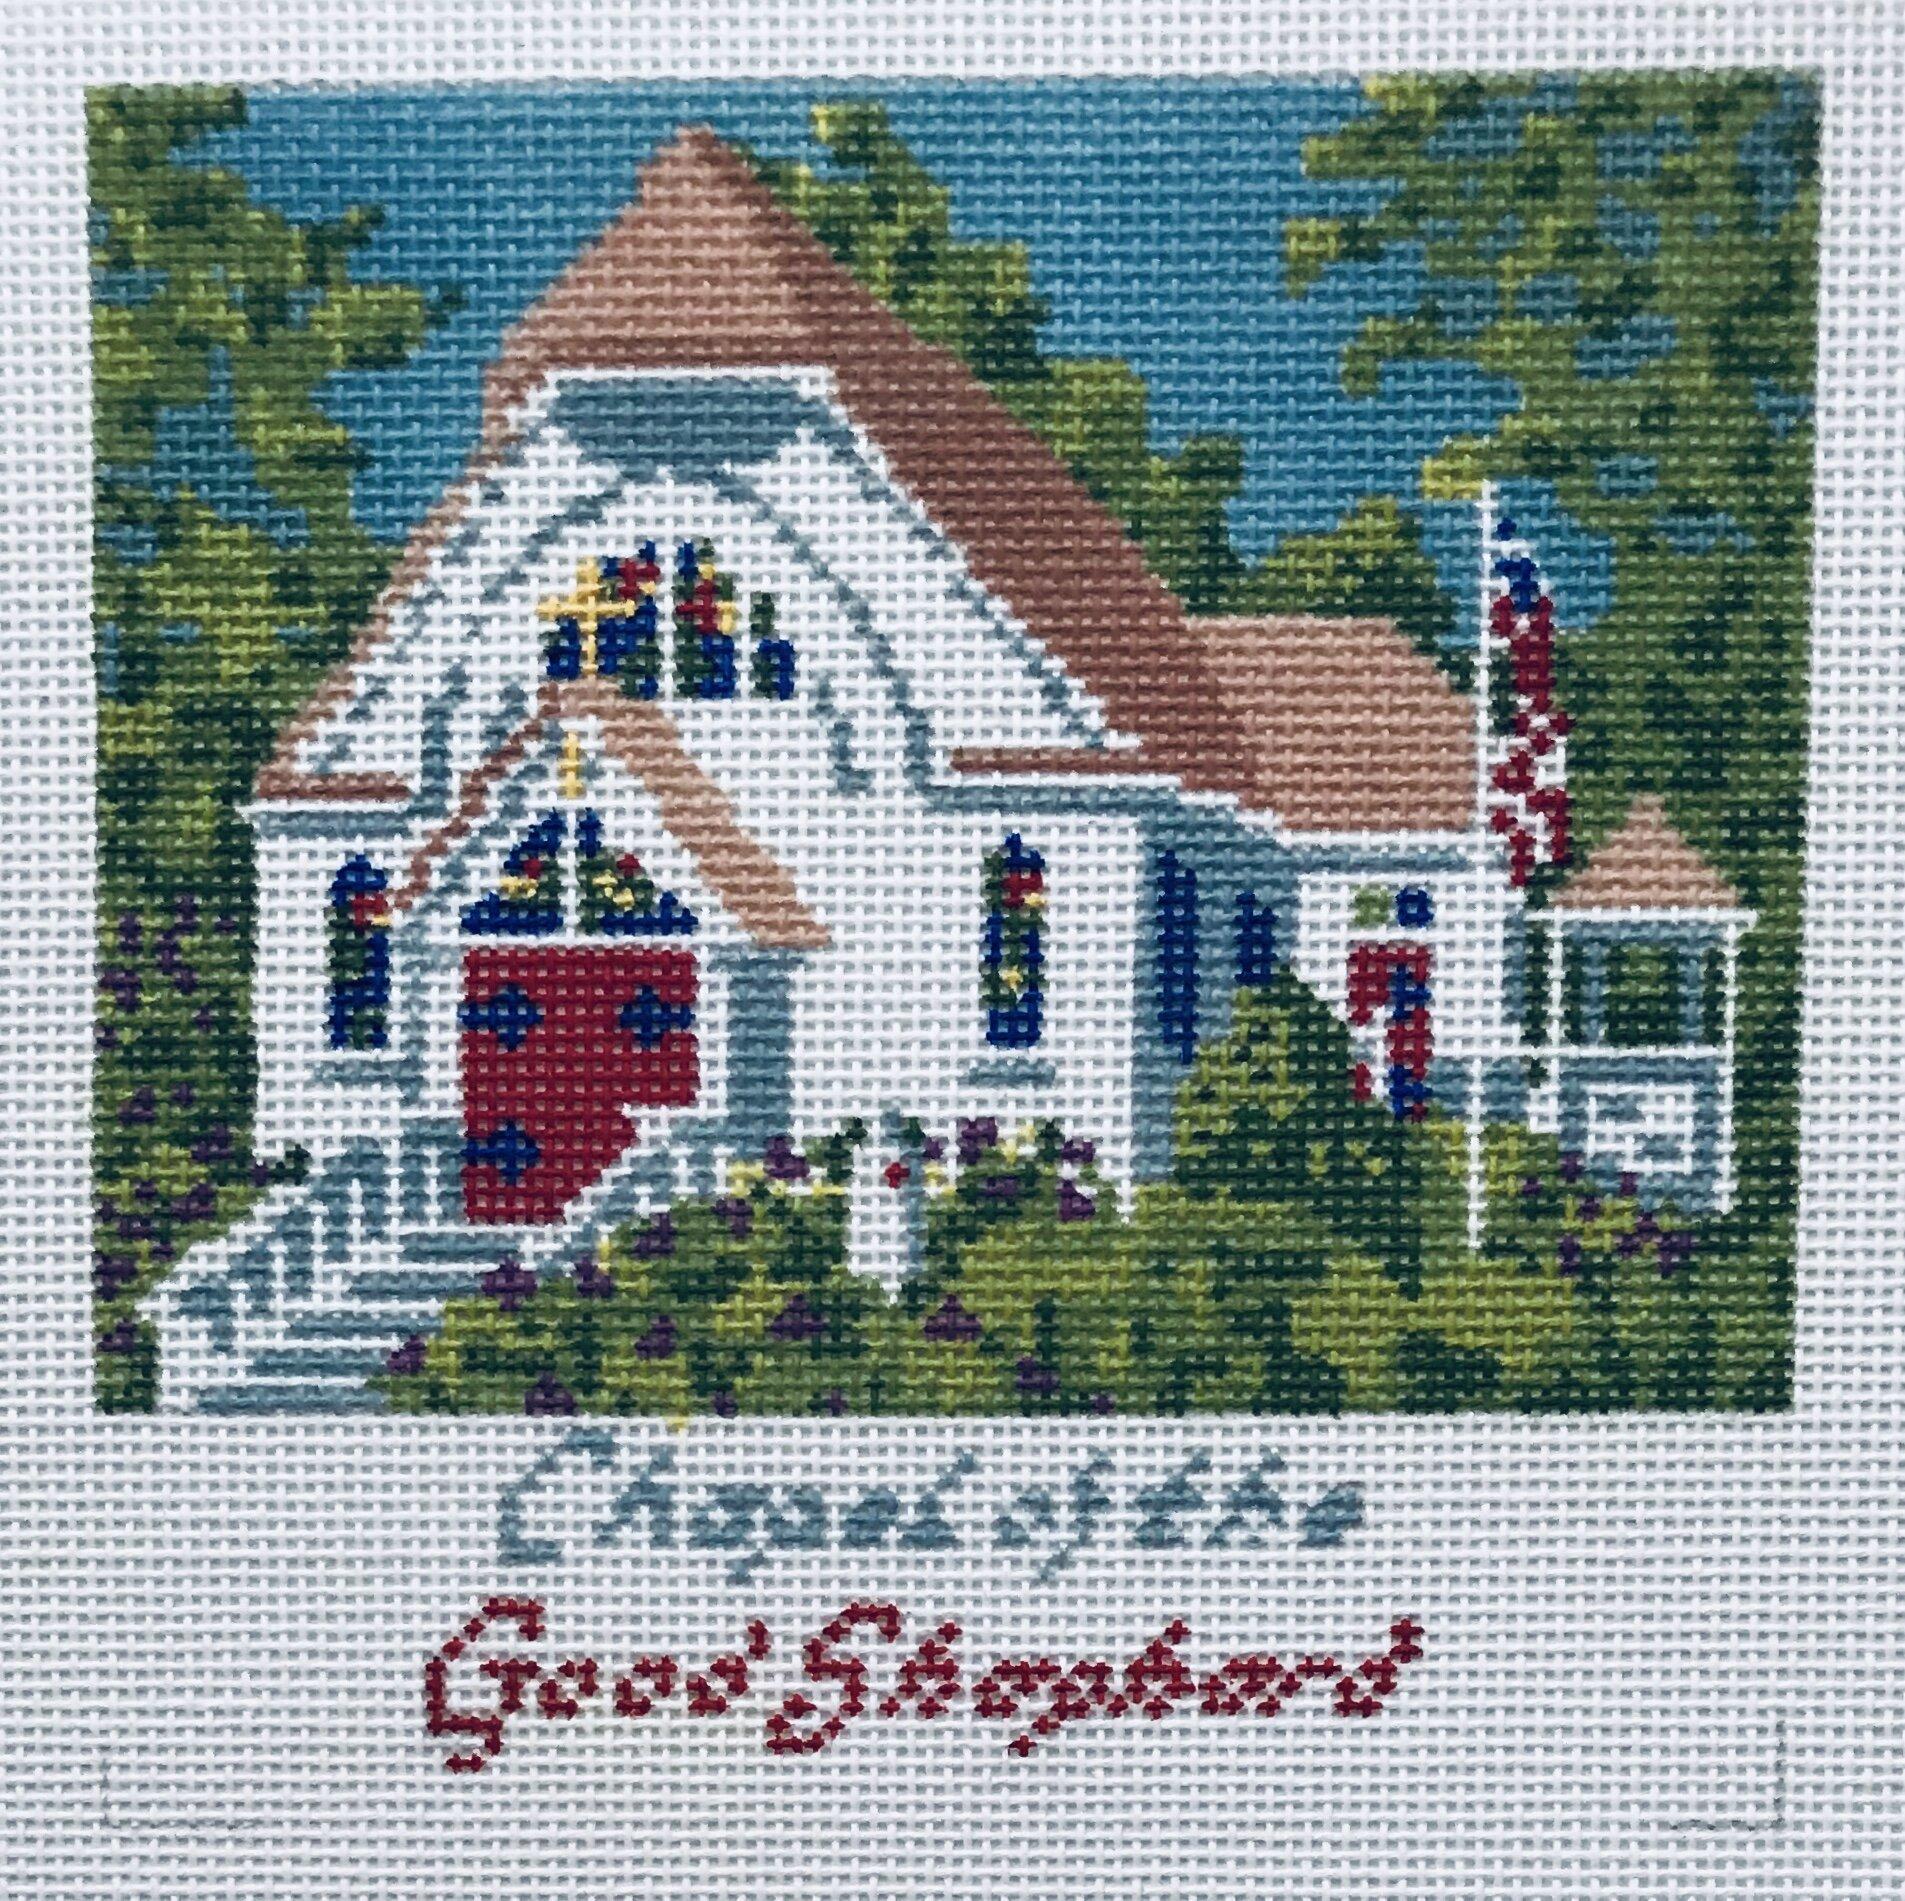 "Chapel of the Good Shepard - Chautauqua AL62   5"" x 5"" on 18 mesh"